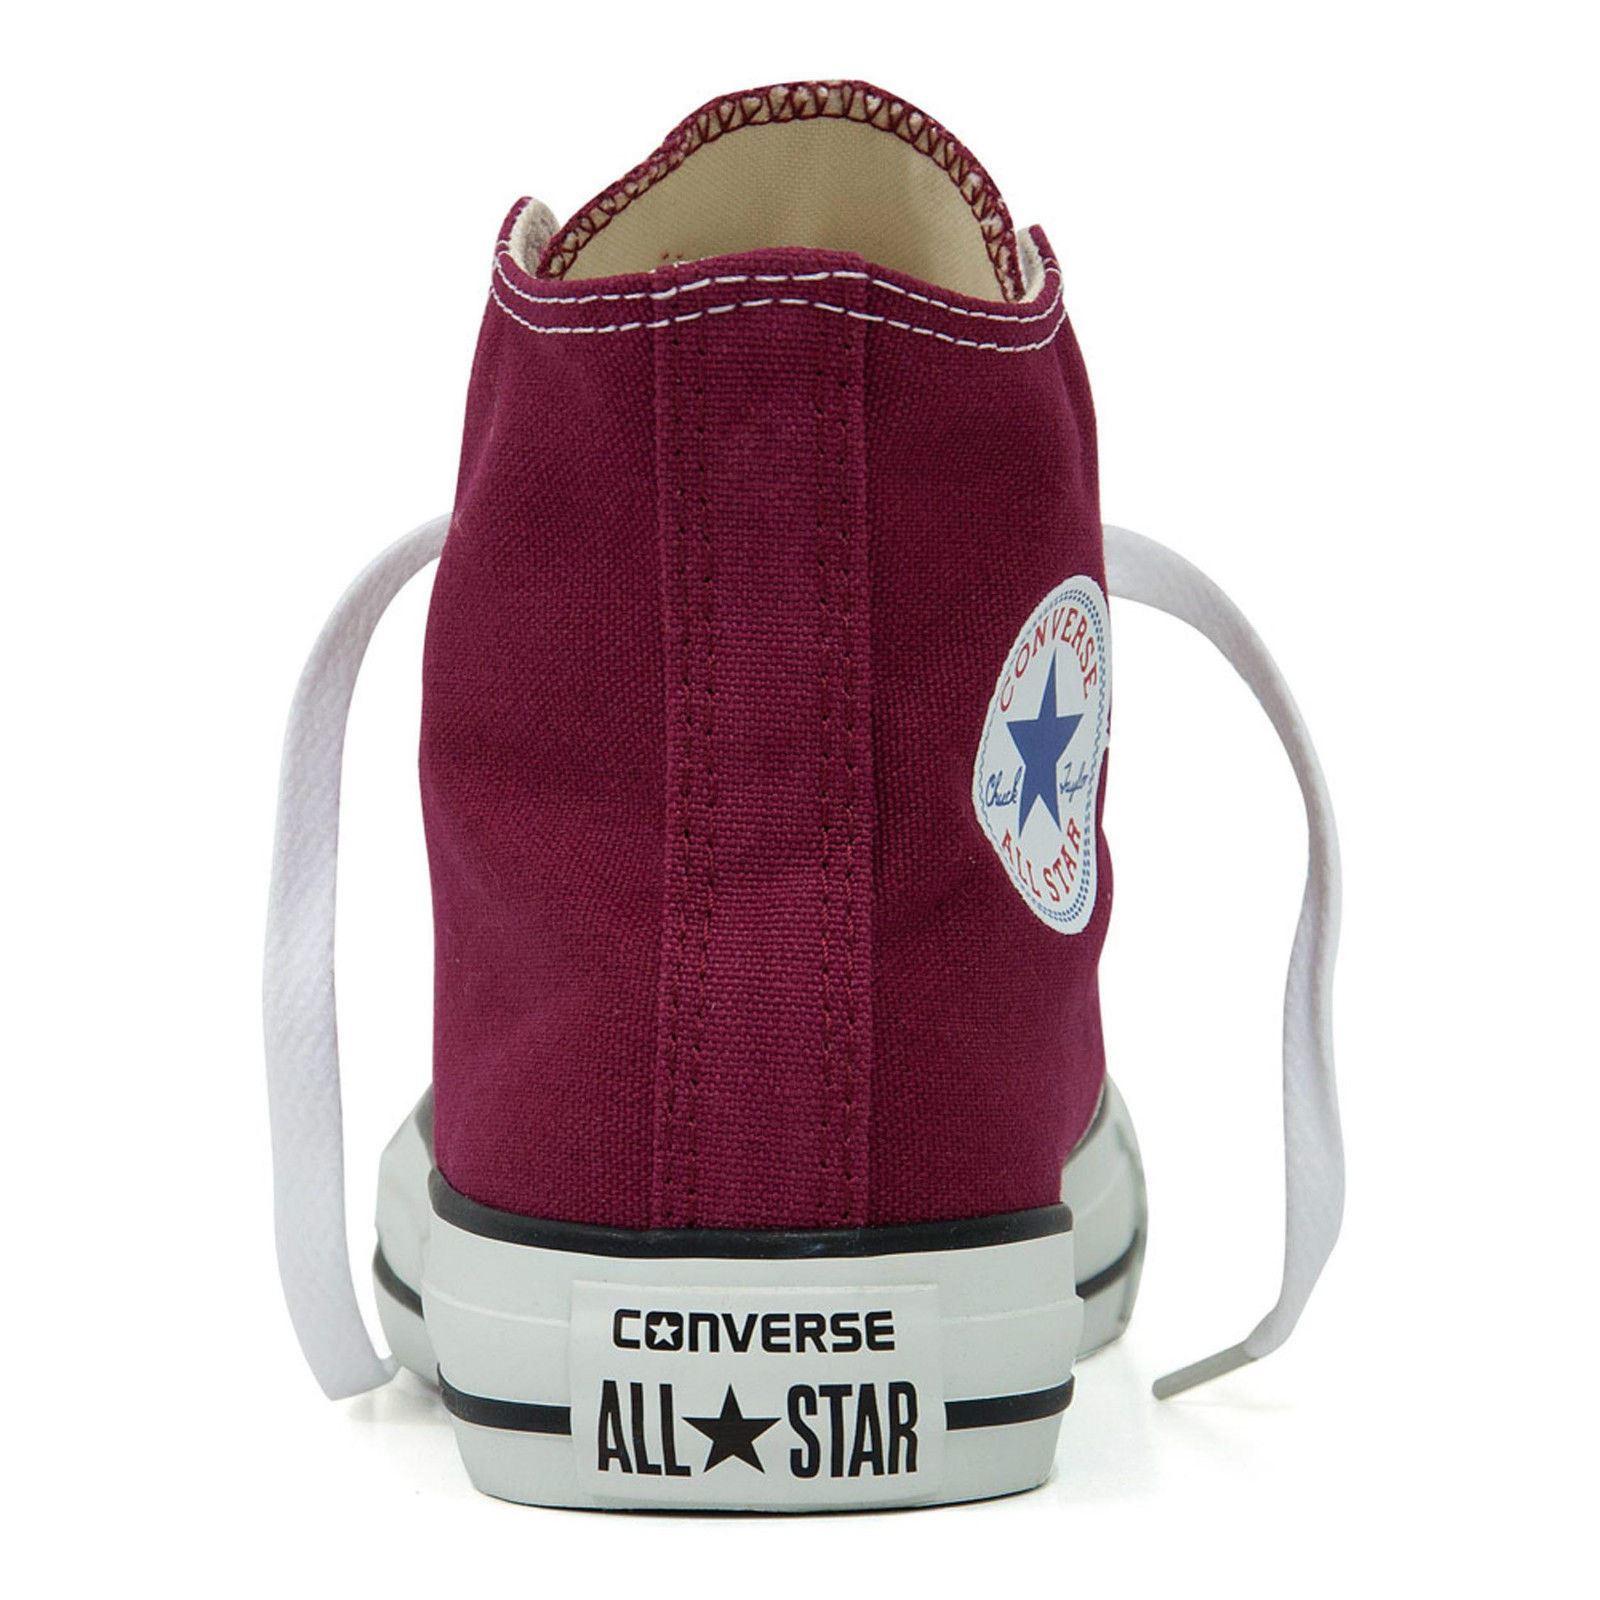 Converse-All-Star-Mens-Womens-High-Hi-Tops-Unisex-Chuck-Taylor-Trainers-Pumps thumbnail 19